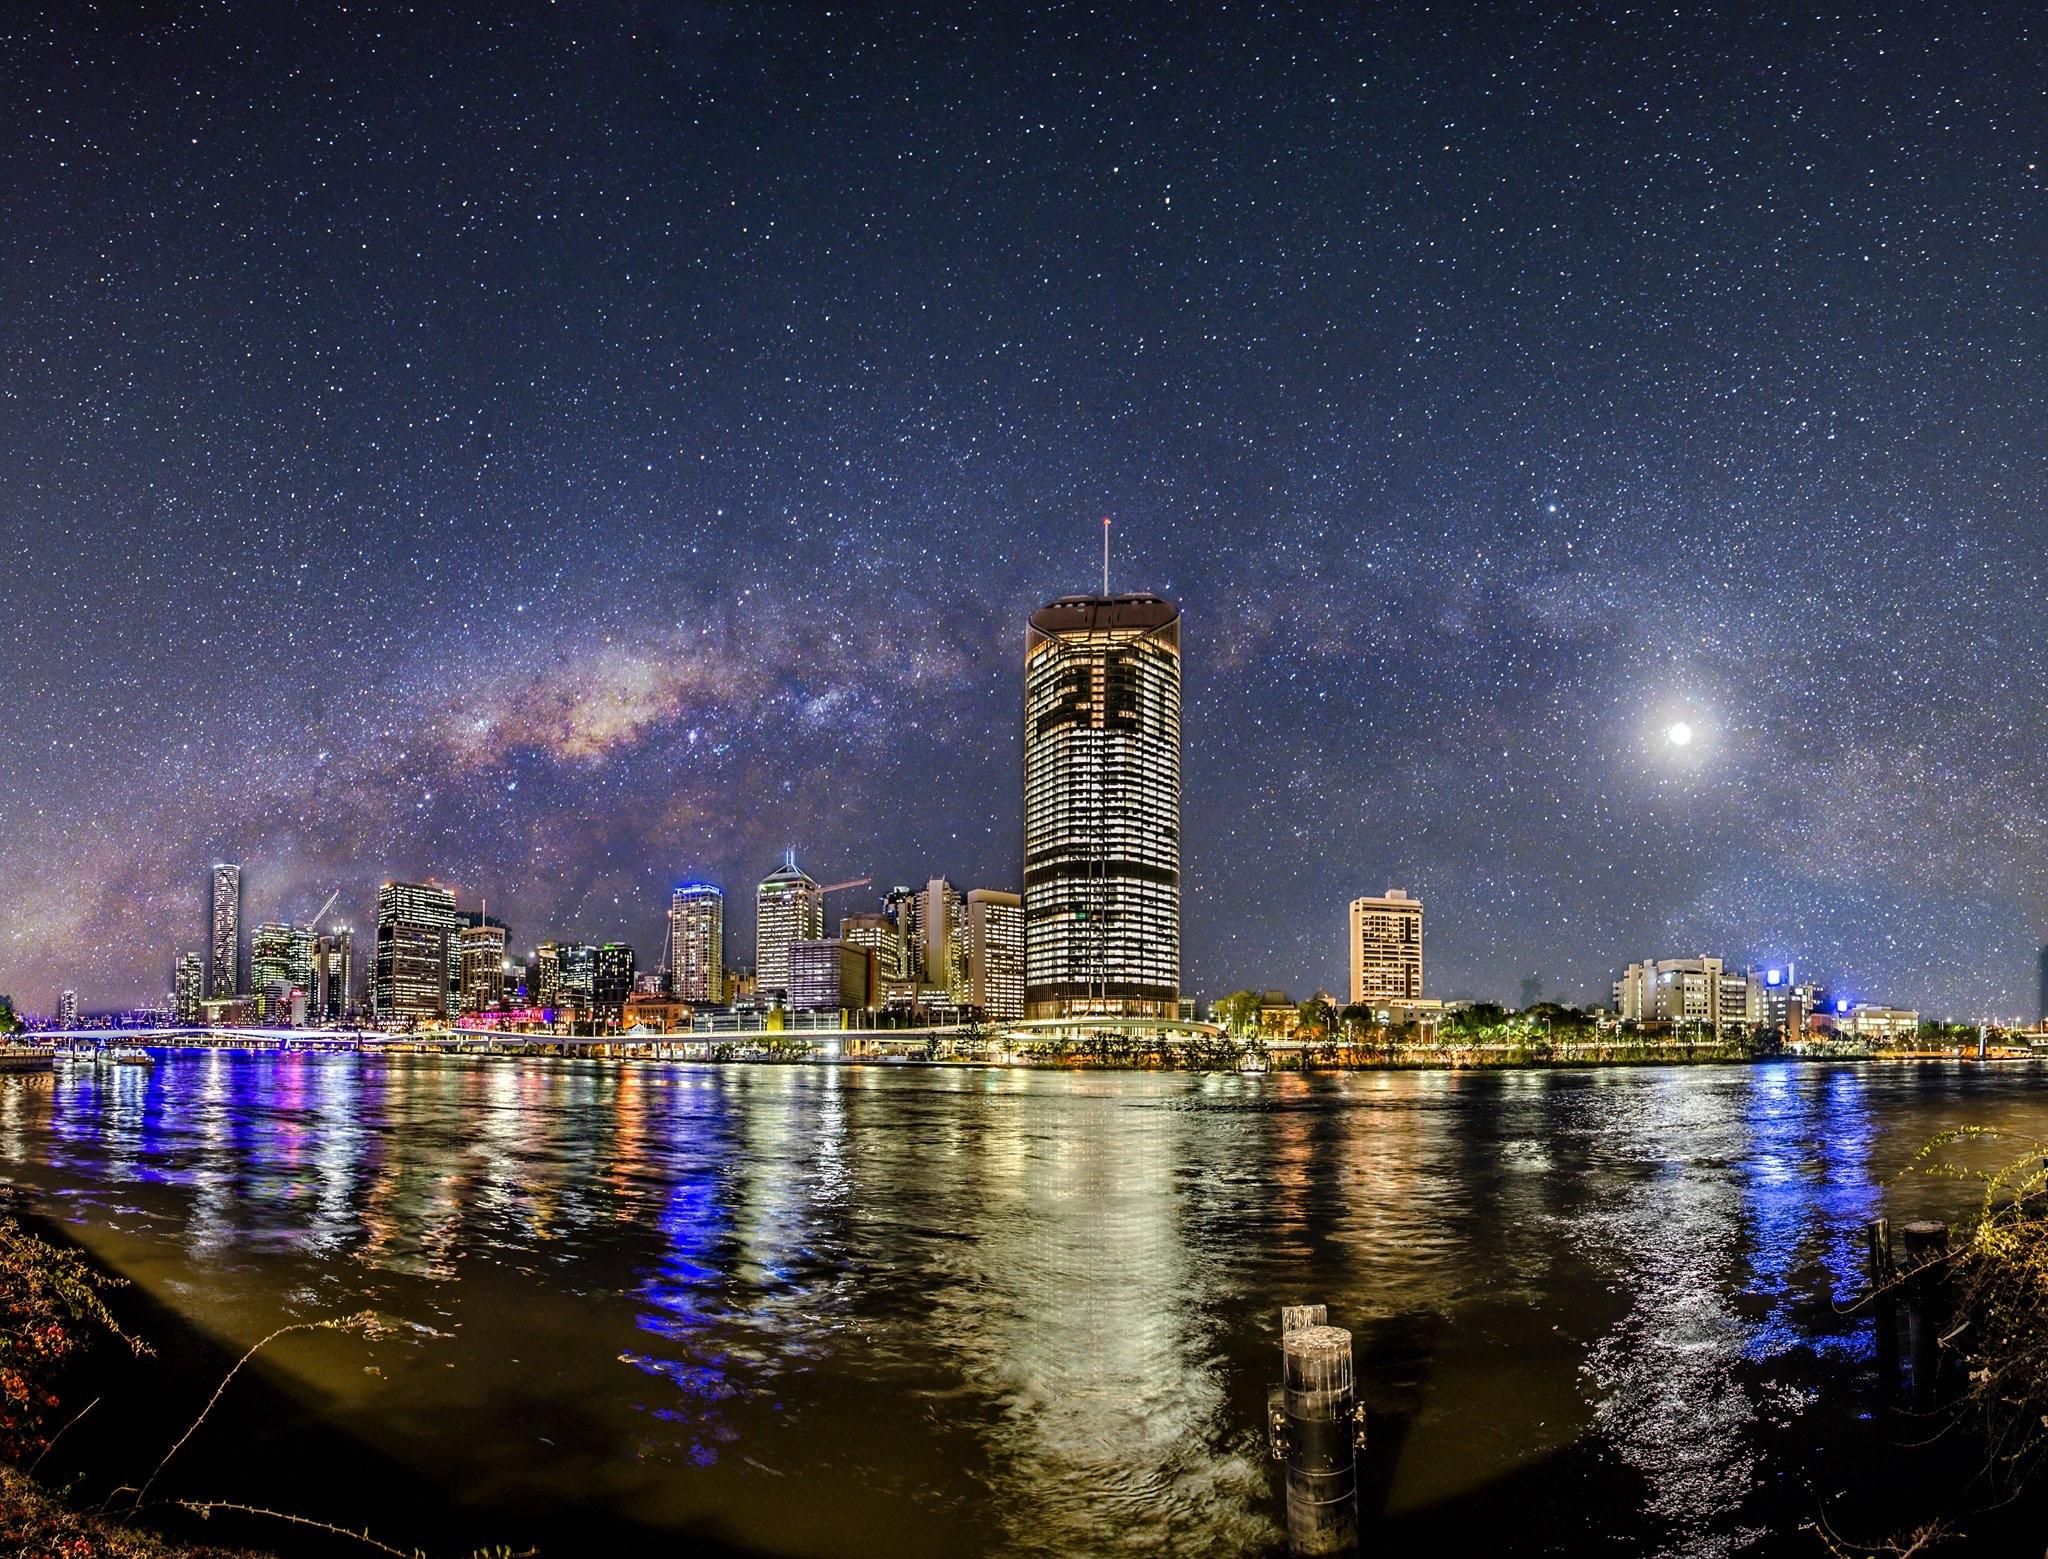 city skyline at nighttime